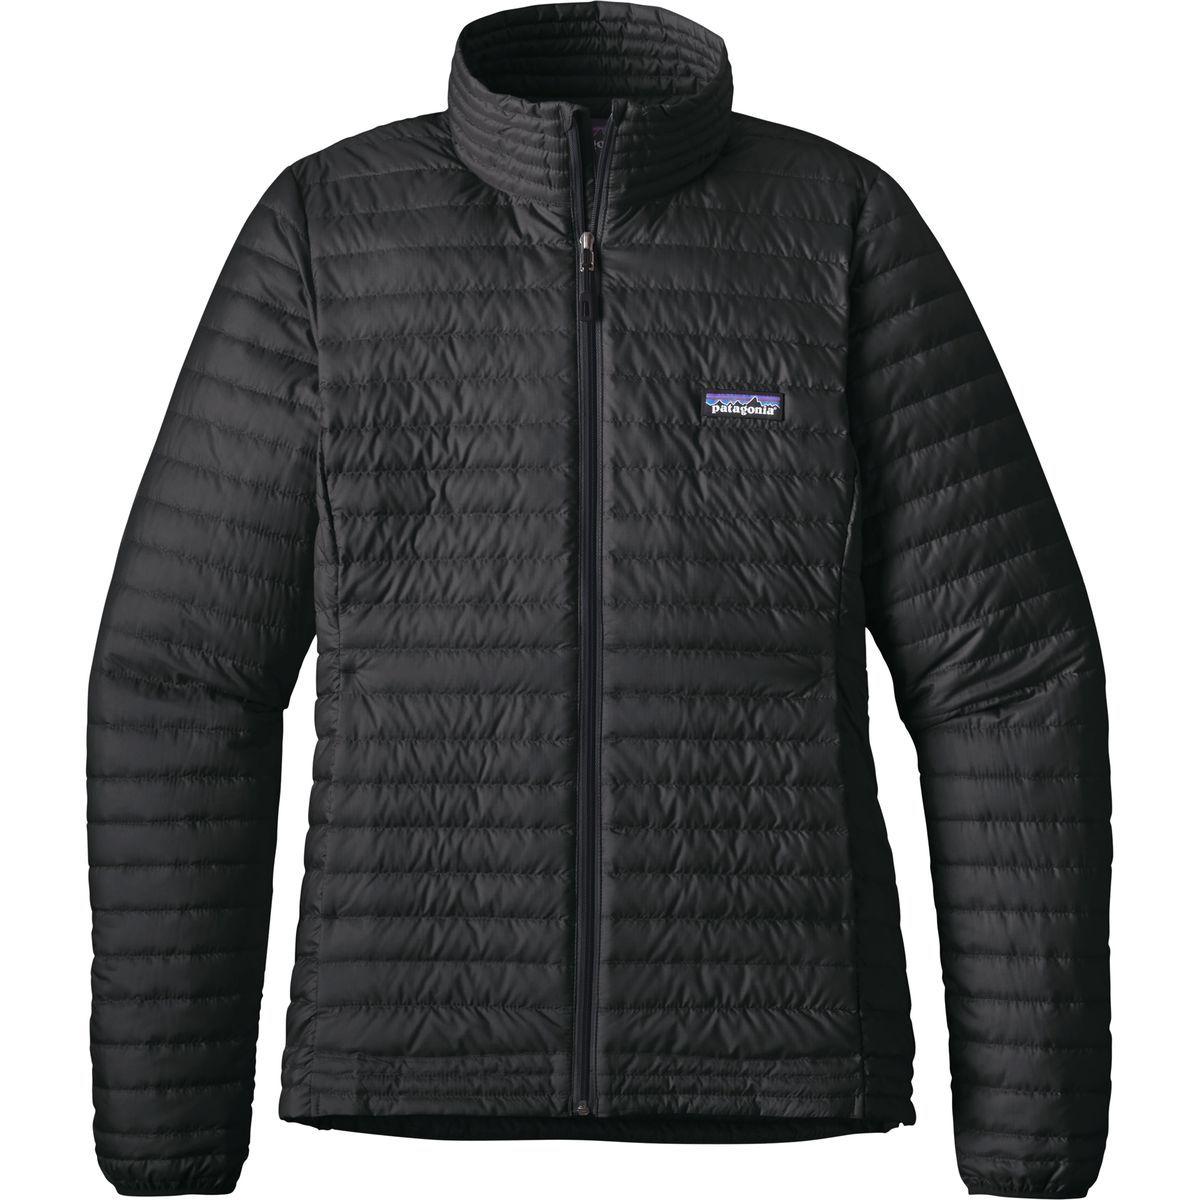 Patagonia Down Shirt Jacket Shirt Jacket Womens Patagonia Down Sweater Jackets [ 1200 x 1200 Pixel ]